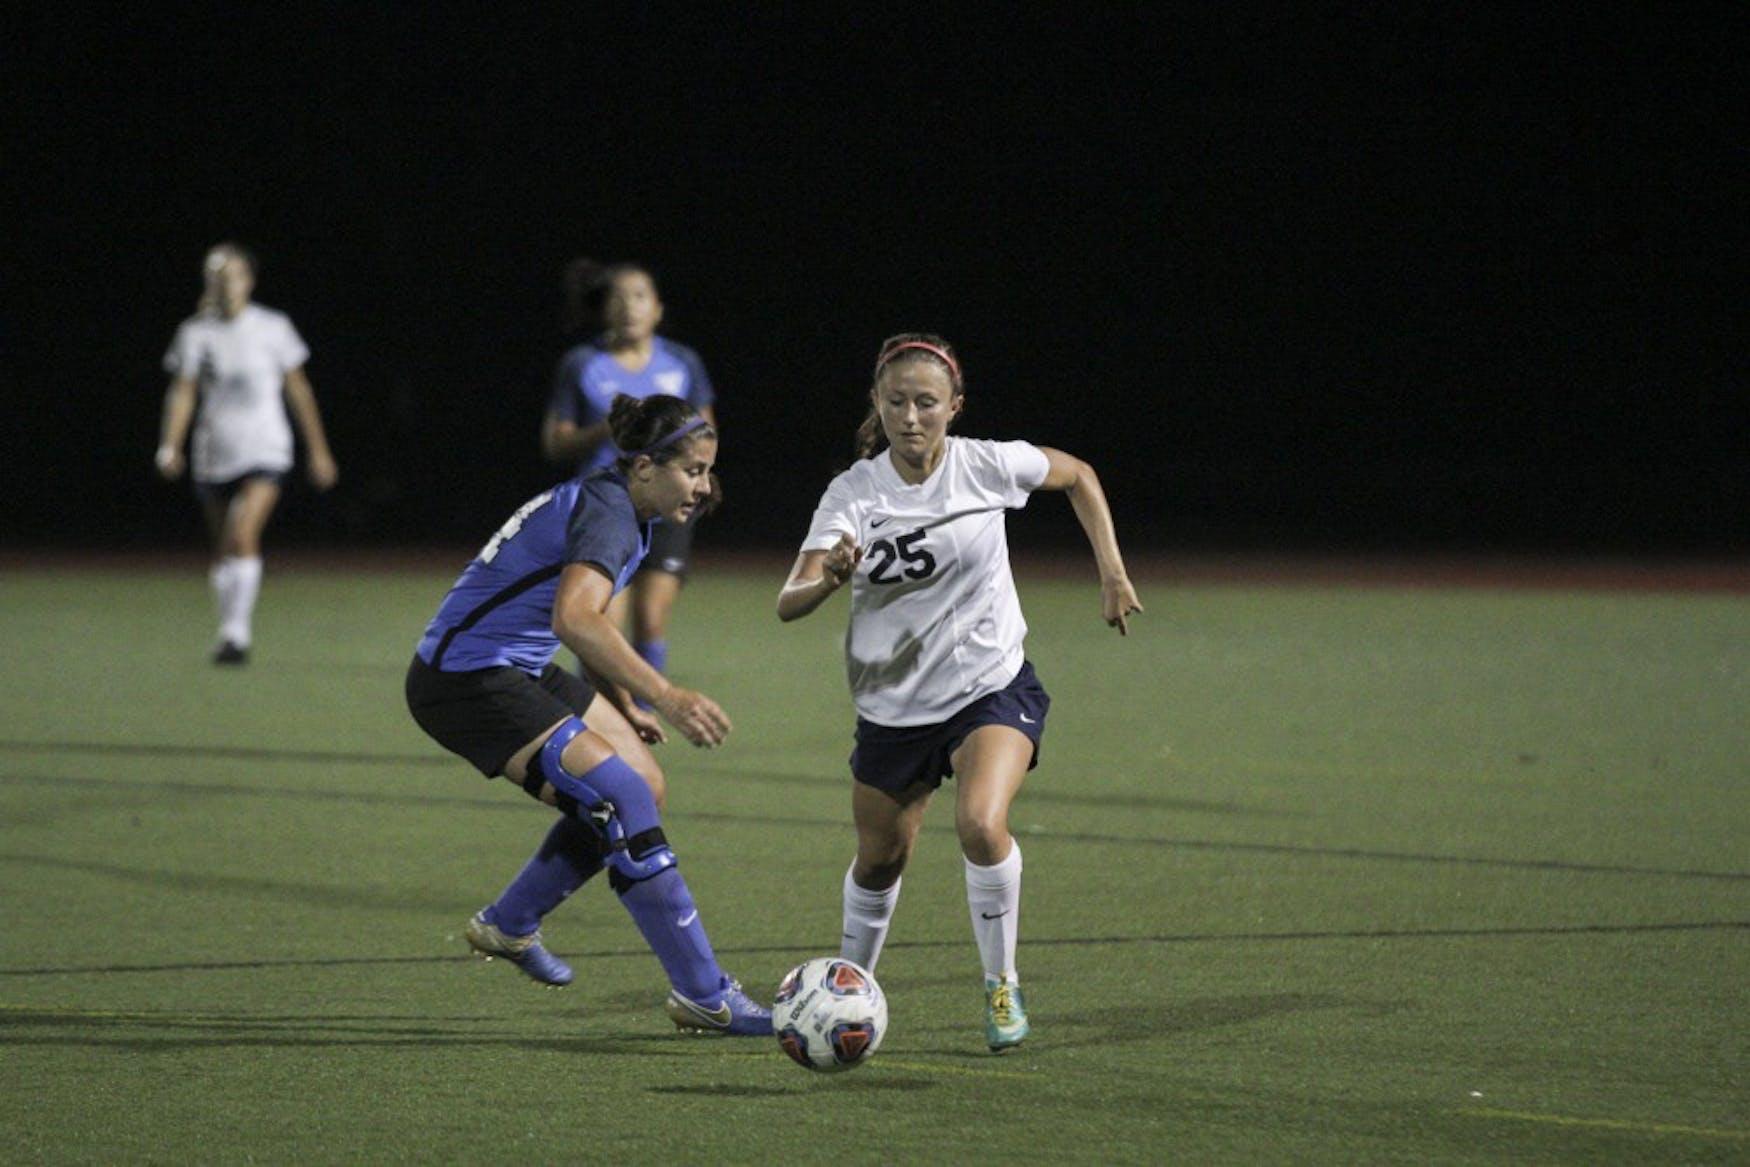 soccer-w-vs-wellesley-9-26-17-yc-0244